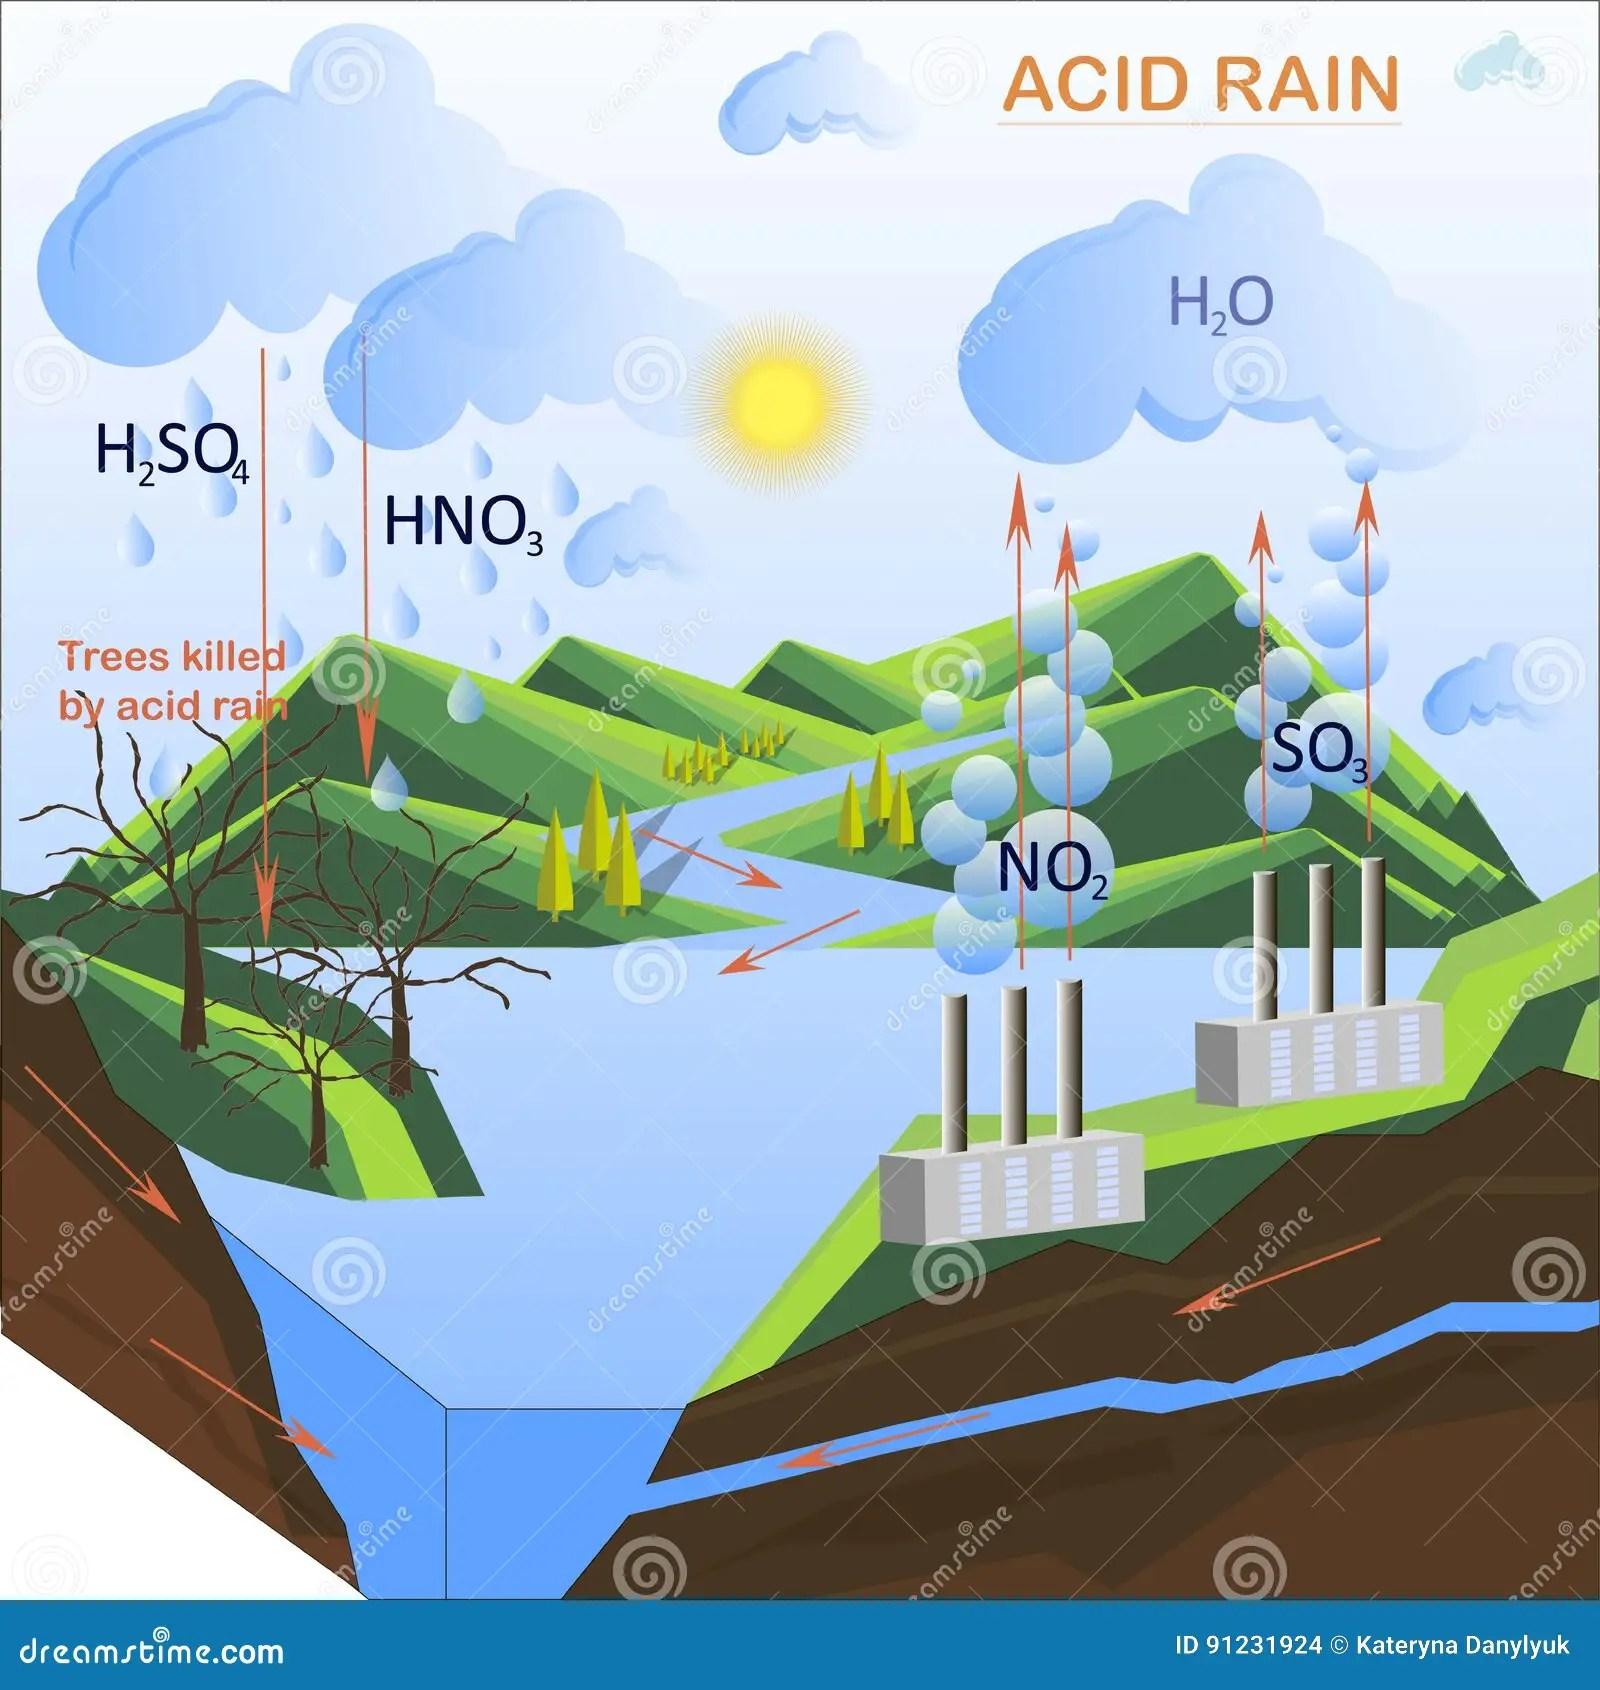 hight resolution of scheme of the acid rain flats design